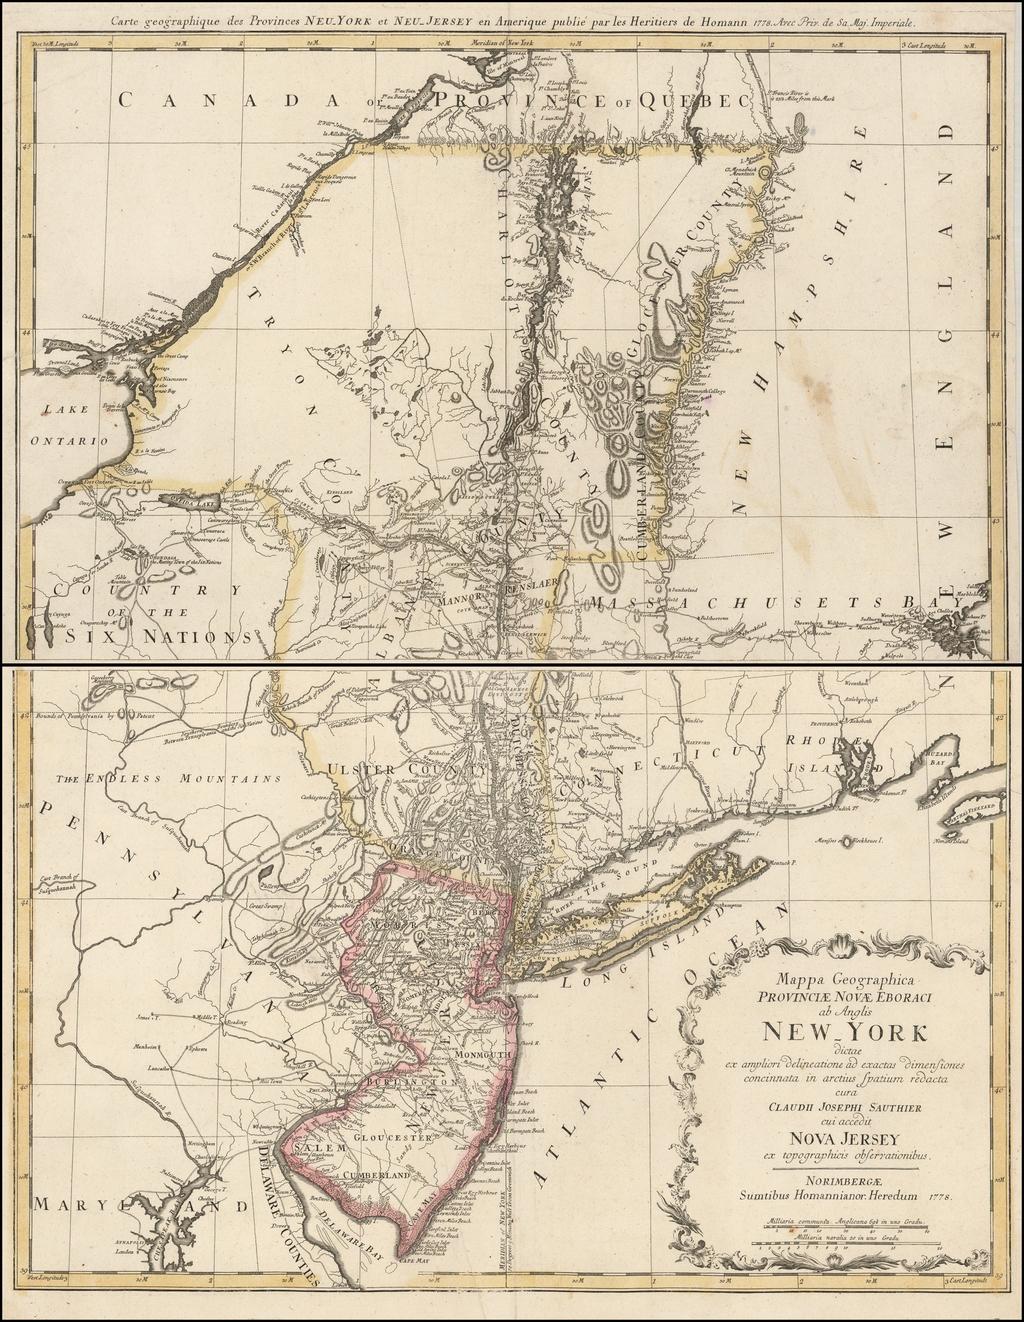 Mappa Geographica Provinciae Novae Eboraci ab Anglis New-York… Claudii Josephi Sauthier cui Accedit Nova Jersey ex topgraphicis . . . 1778 By Homann Heirs / Claude Joseph Sauthier